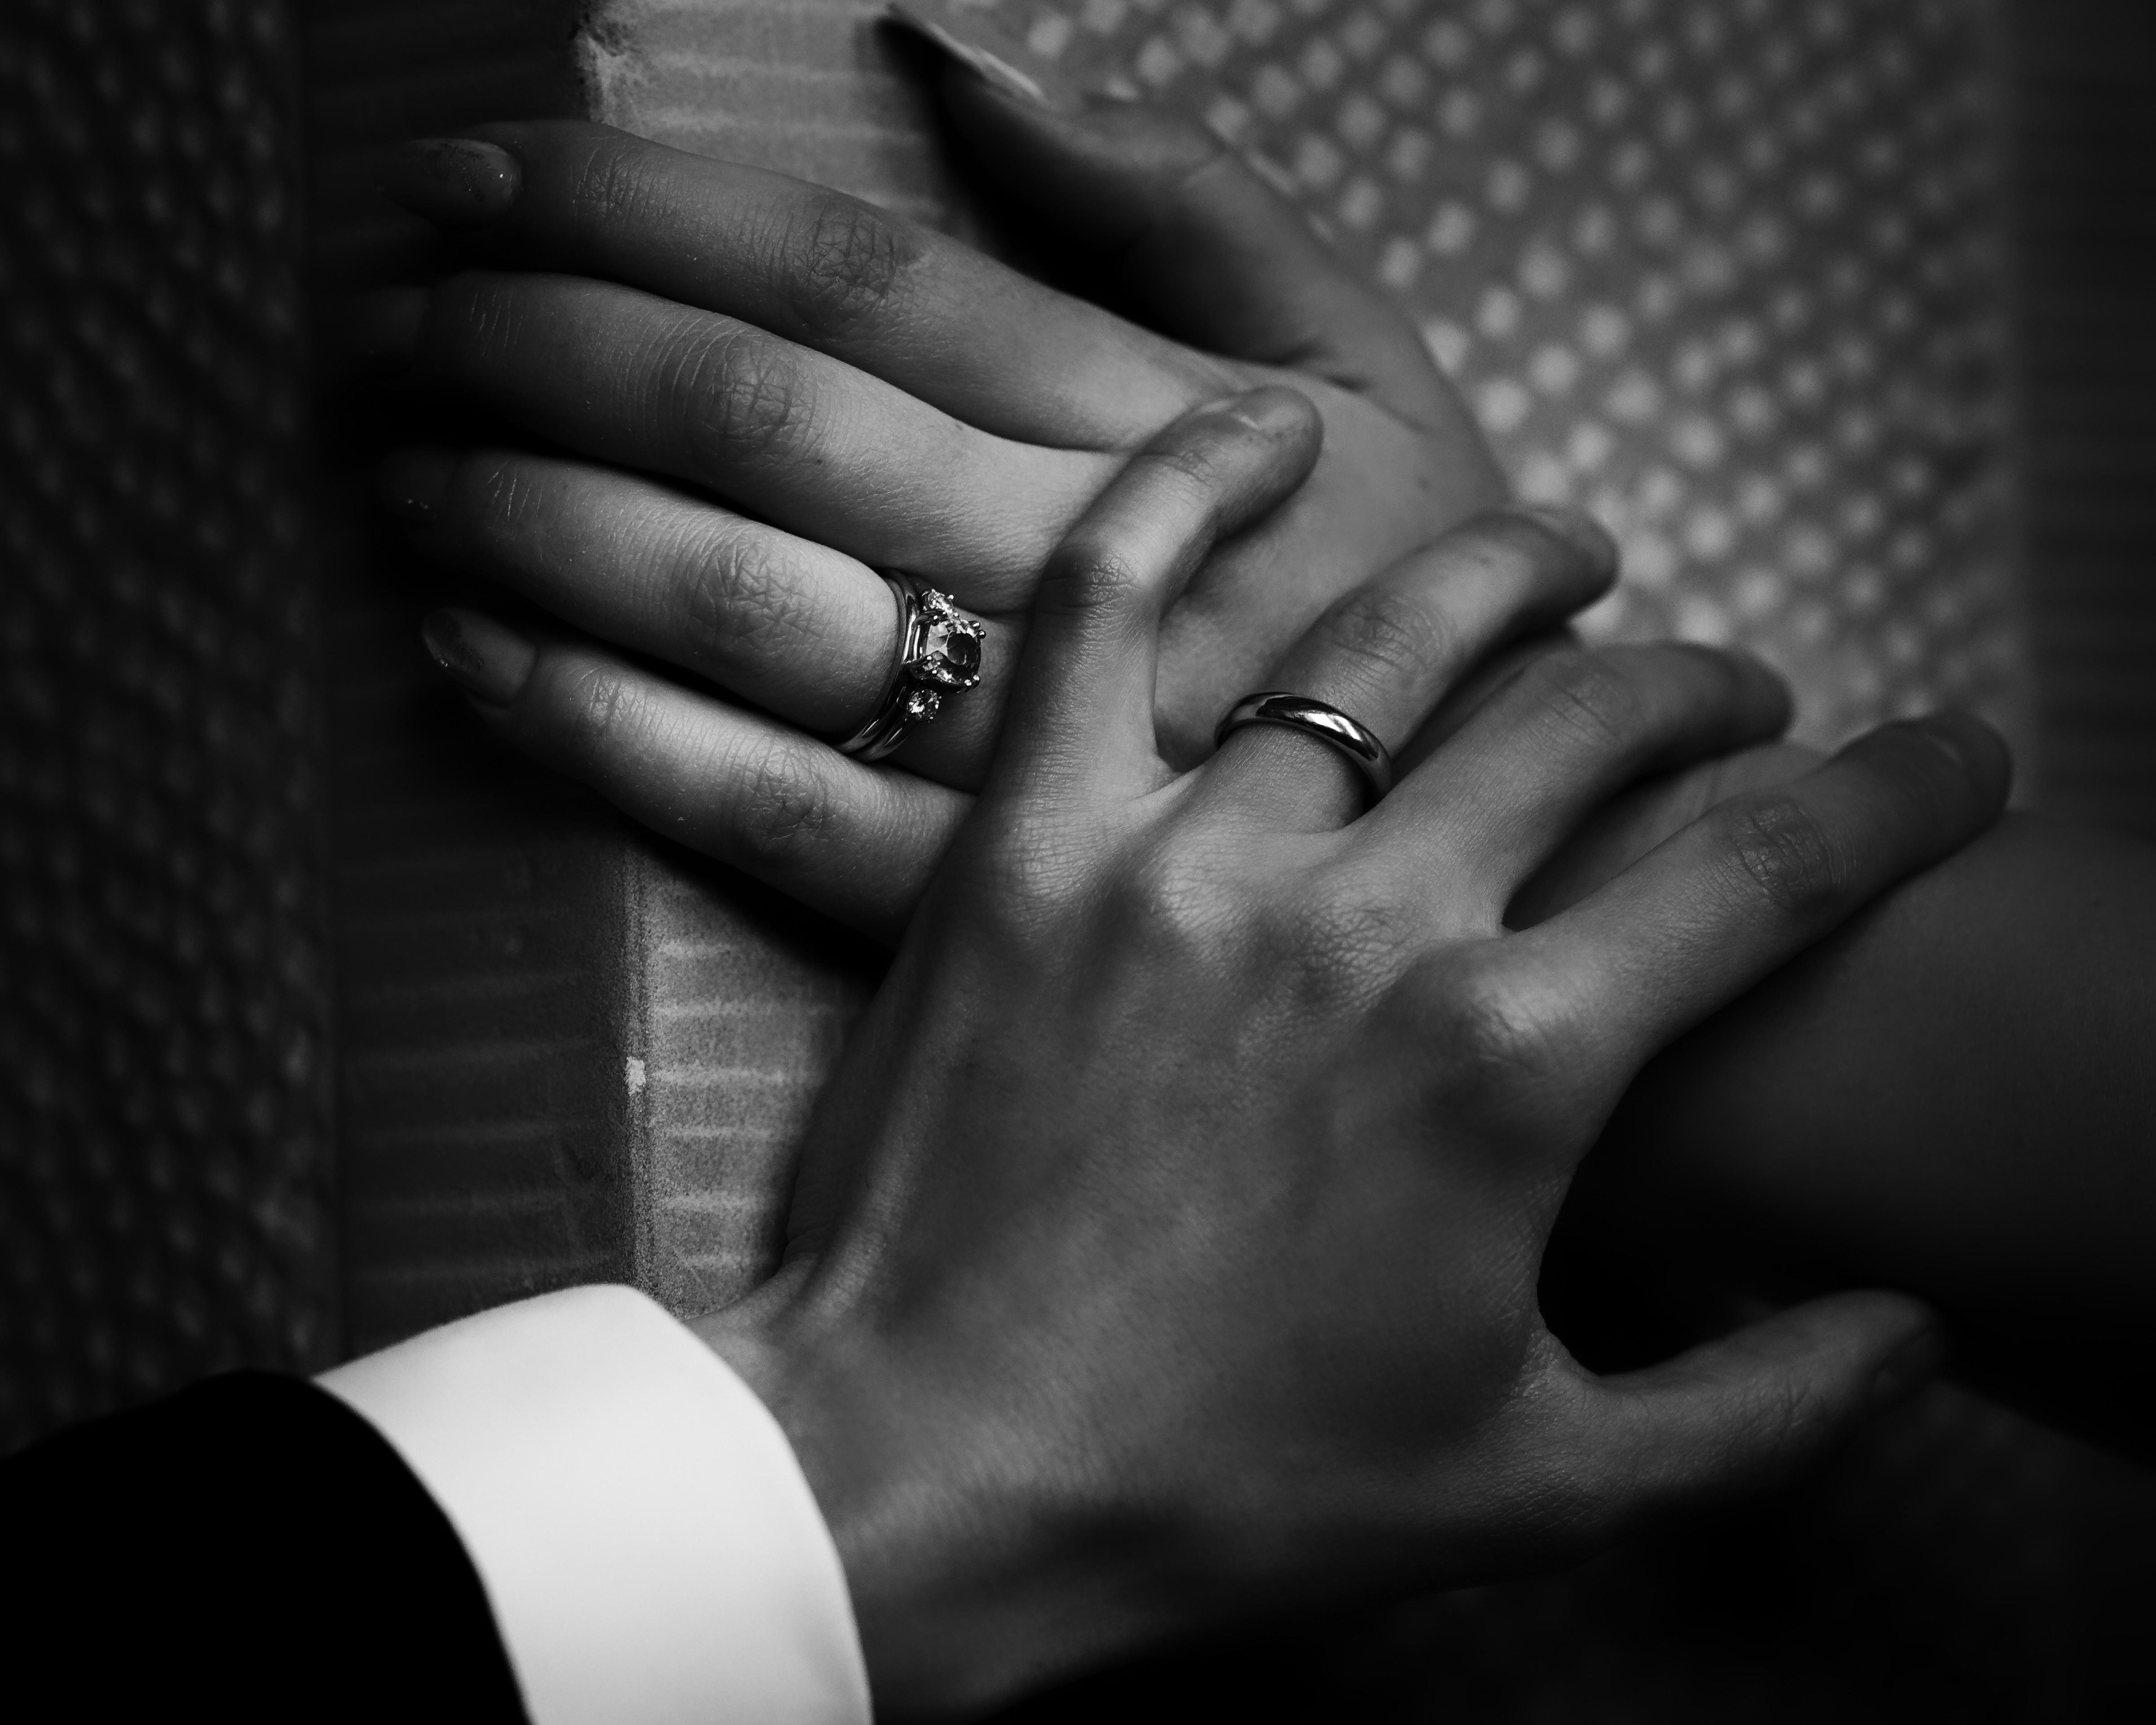 Bröllopsringar, bröllopsporträtt 10